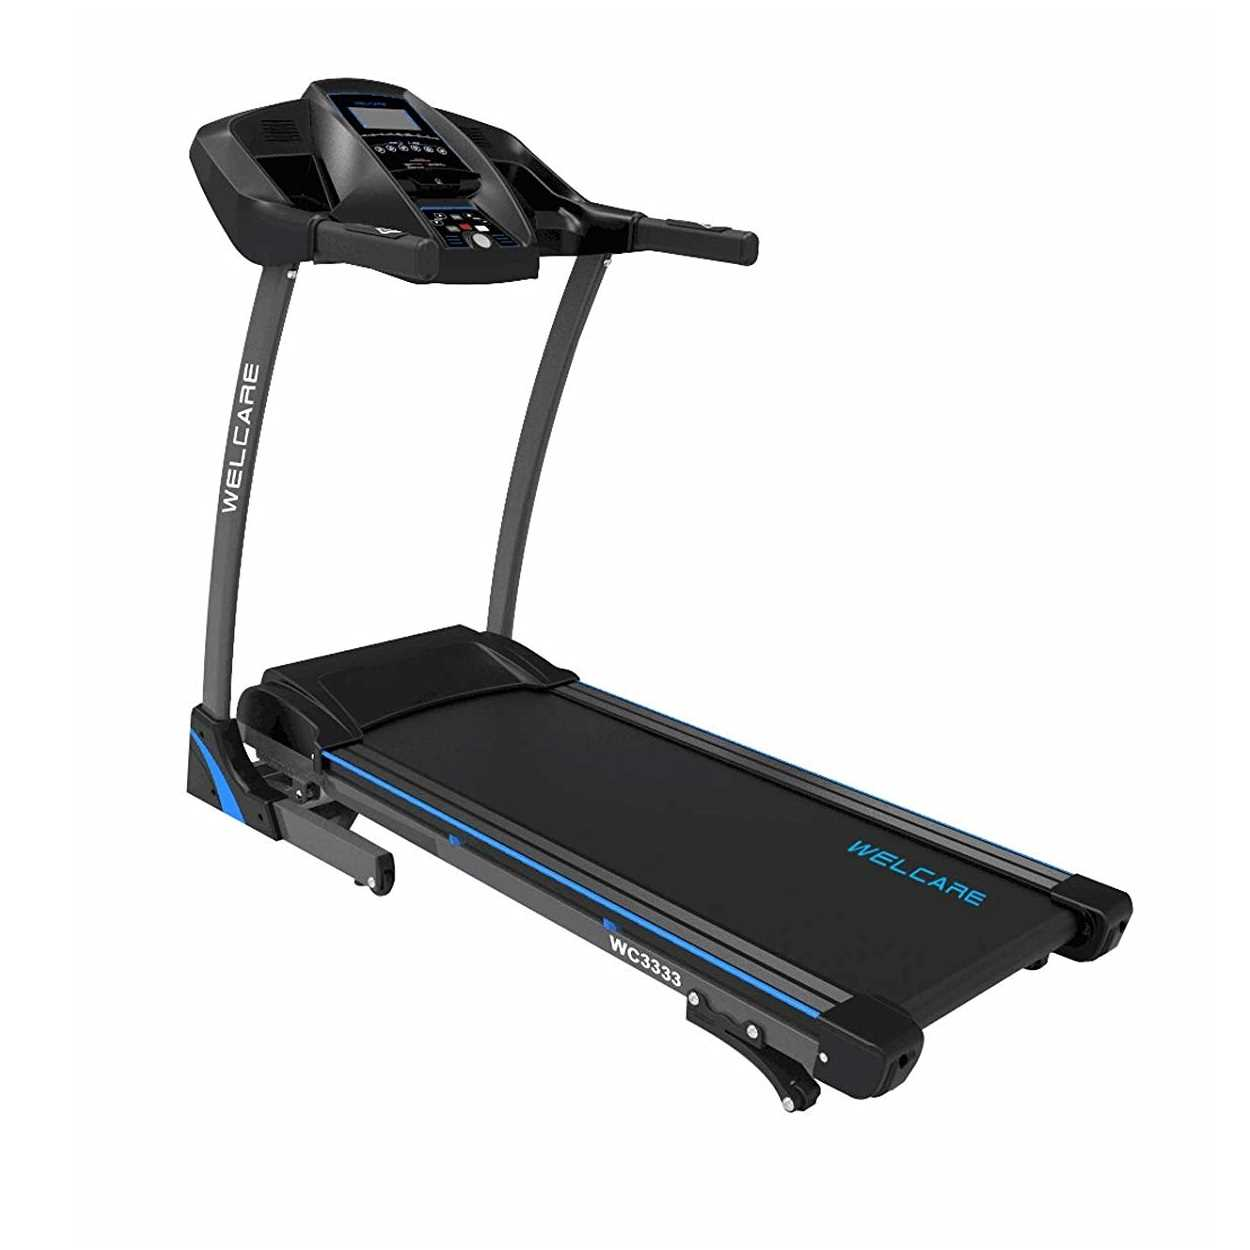 Welcare WC 3333 Motorized Treadmill